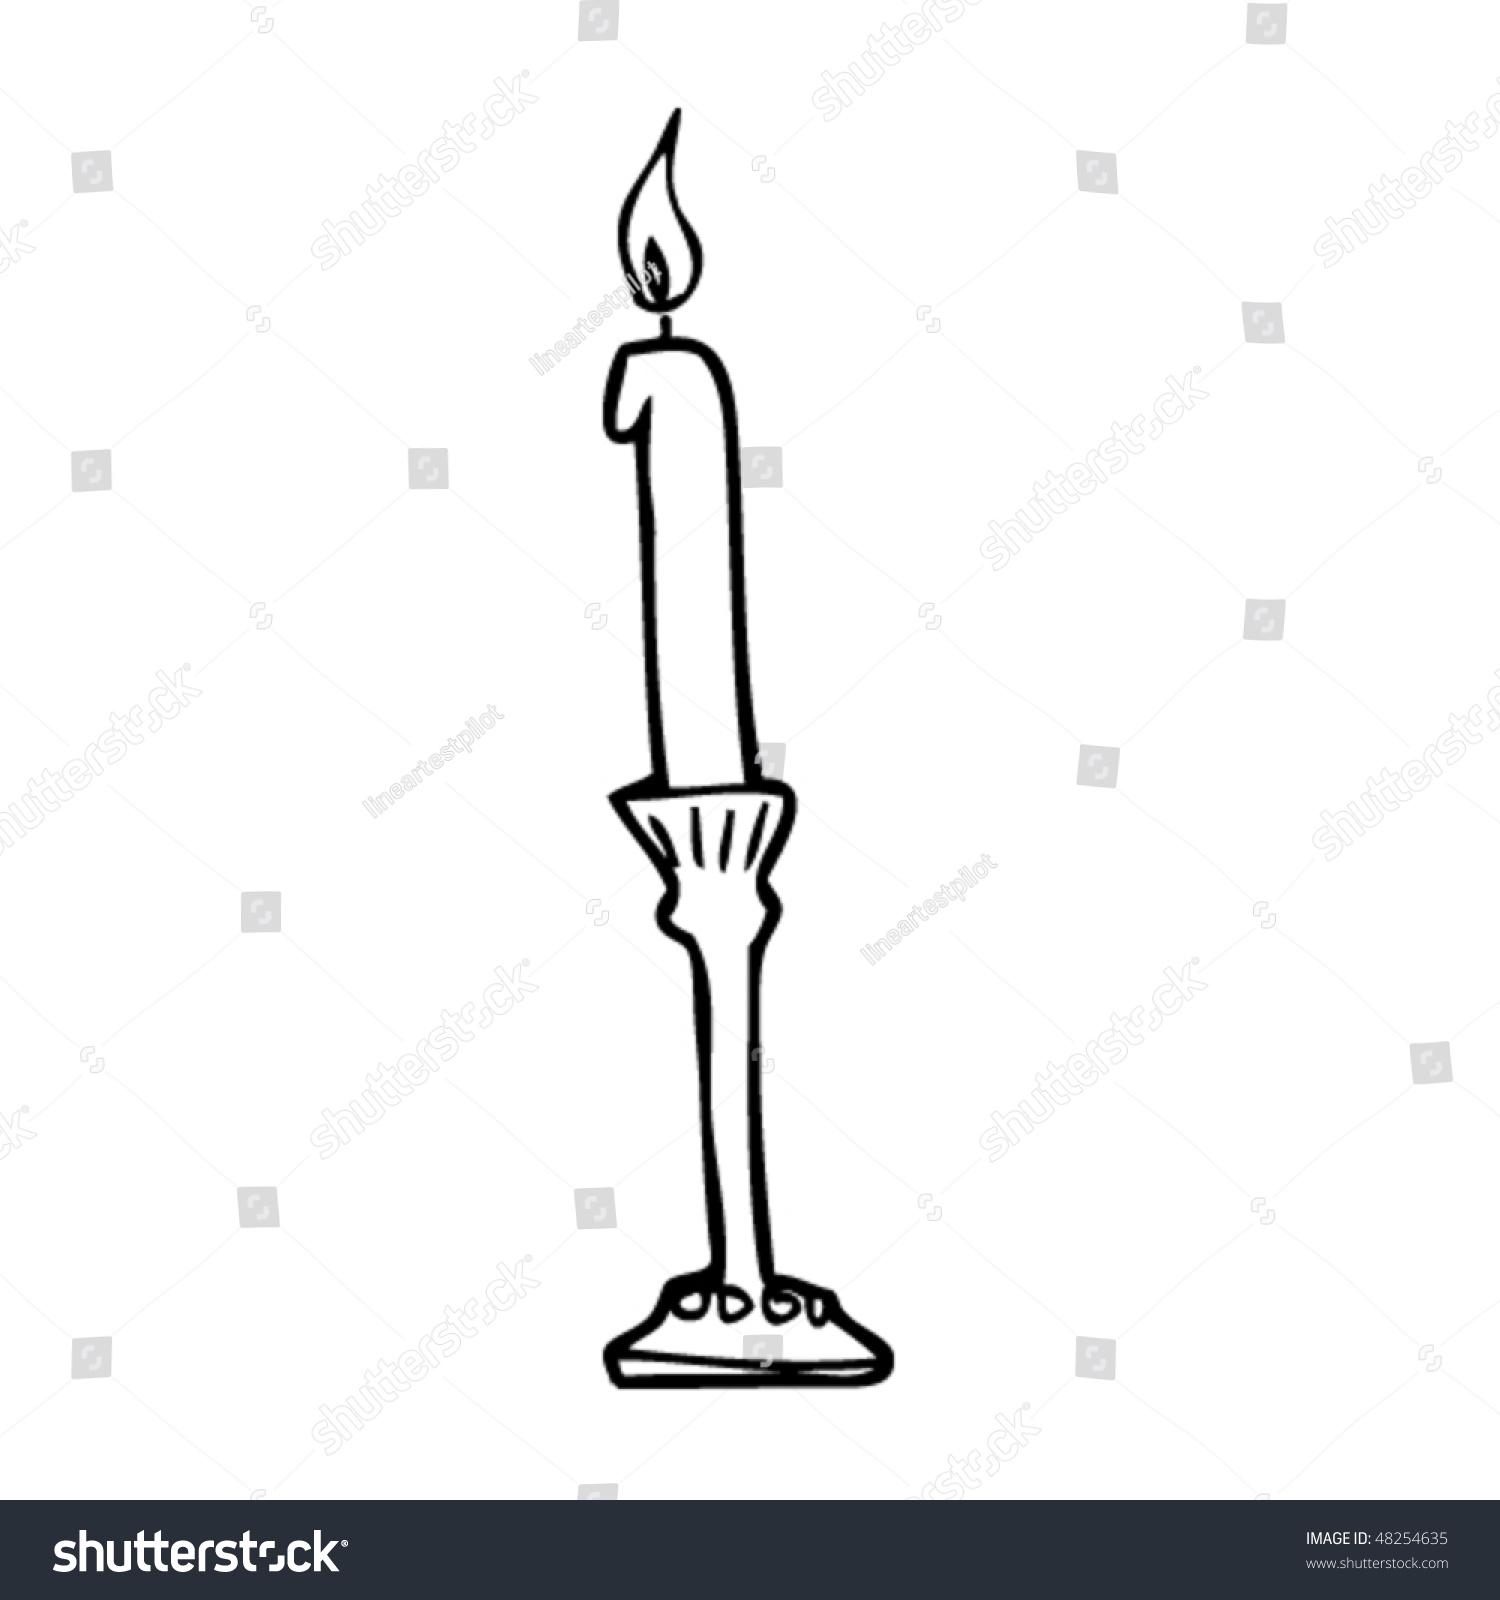 candlestick drawing stock vector 48254635 shutterstock